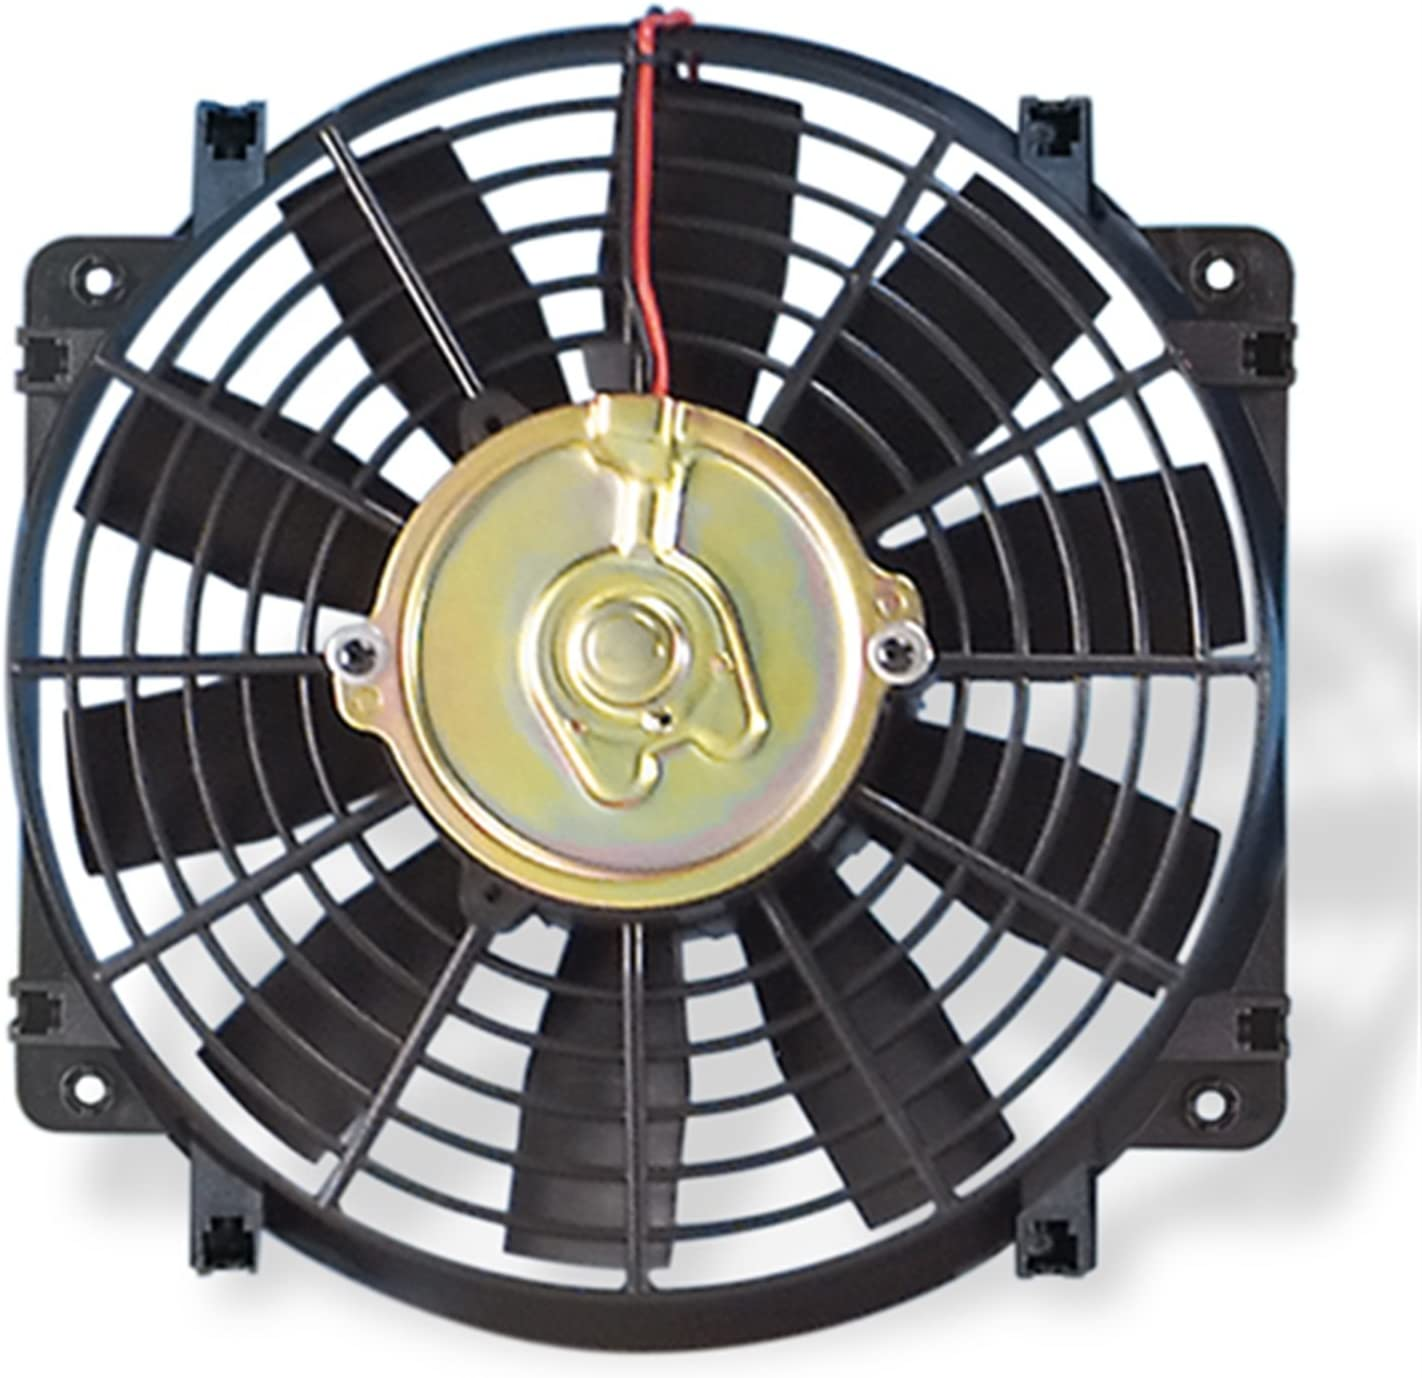 "Flex-a-lite 108 Black 10"" Trimline Electric Fan (reversible)"